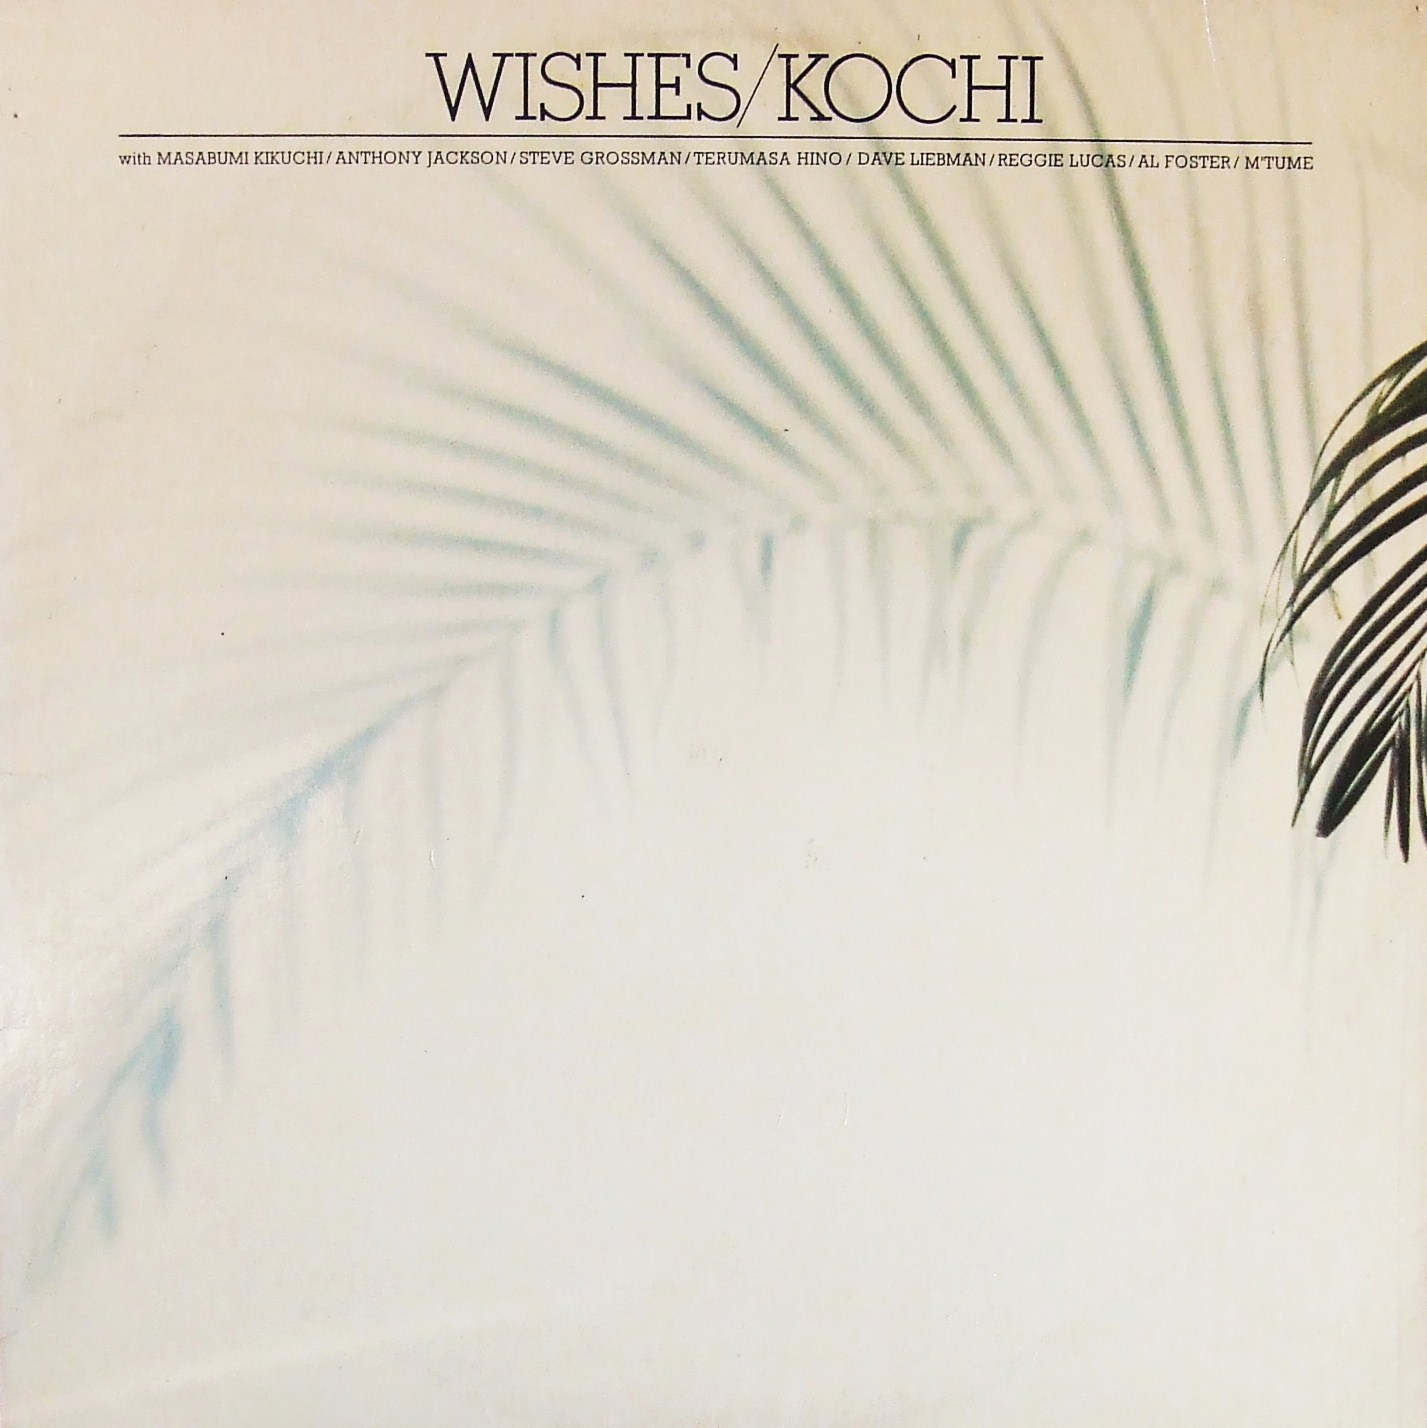 MASABUMI KIKUCHI - Wishes/Kochi cover